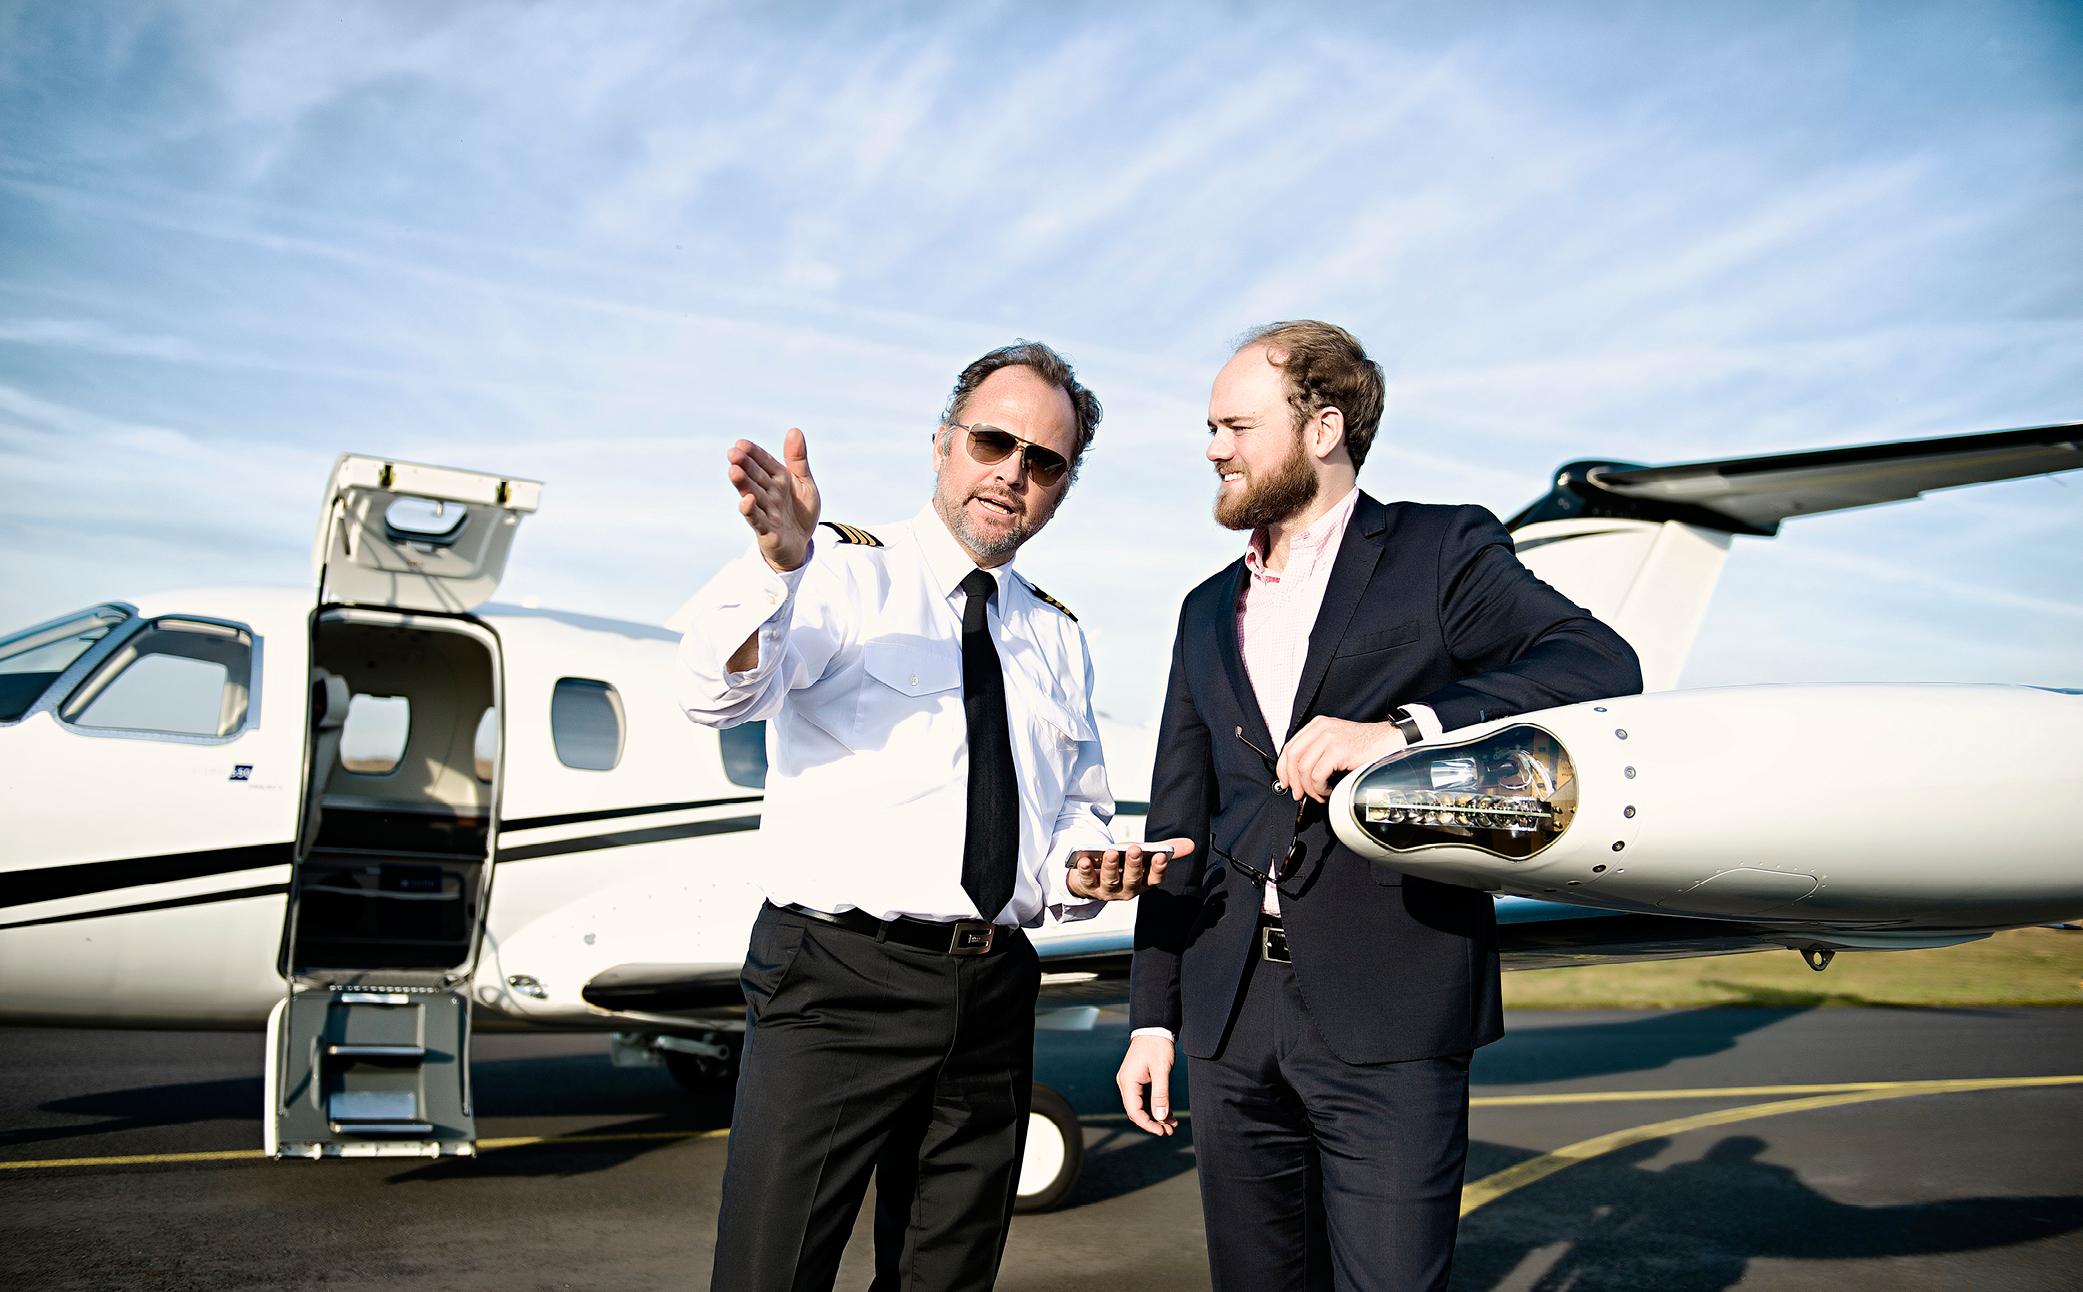 Hier sehen Sie einen Piloten - Business Portraits - Business Branding Fotograf Berlin